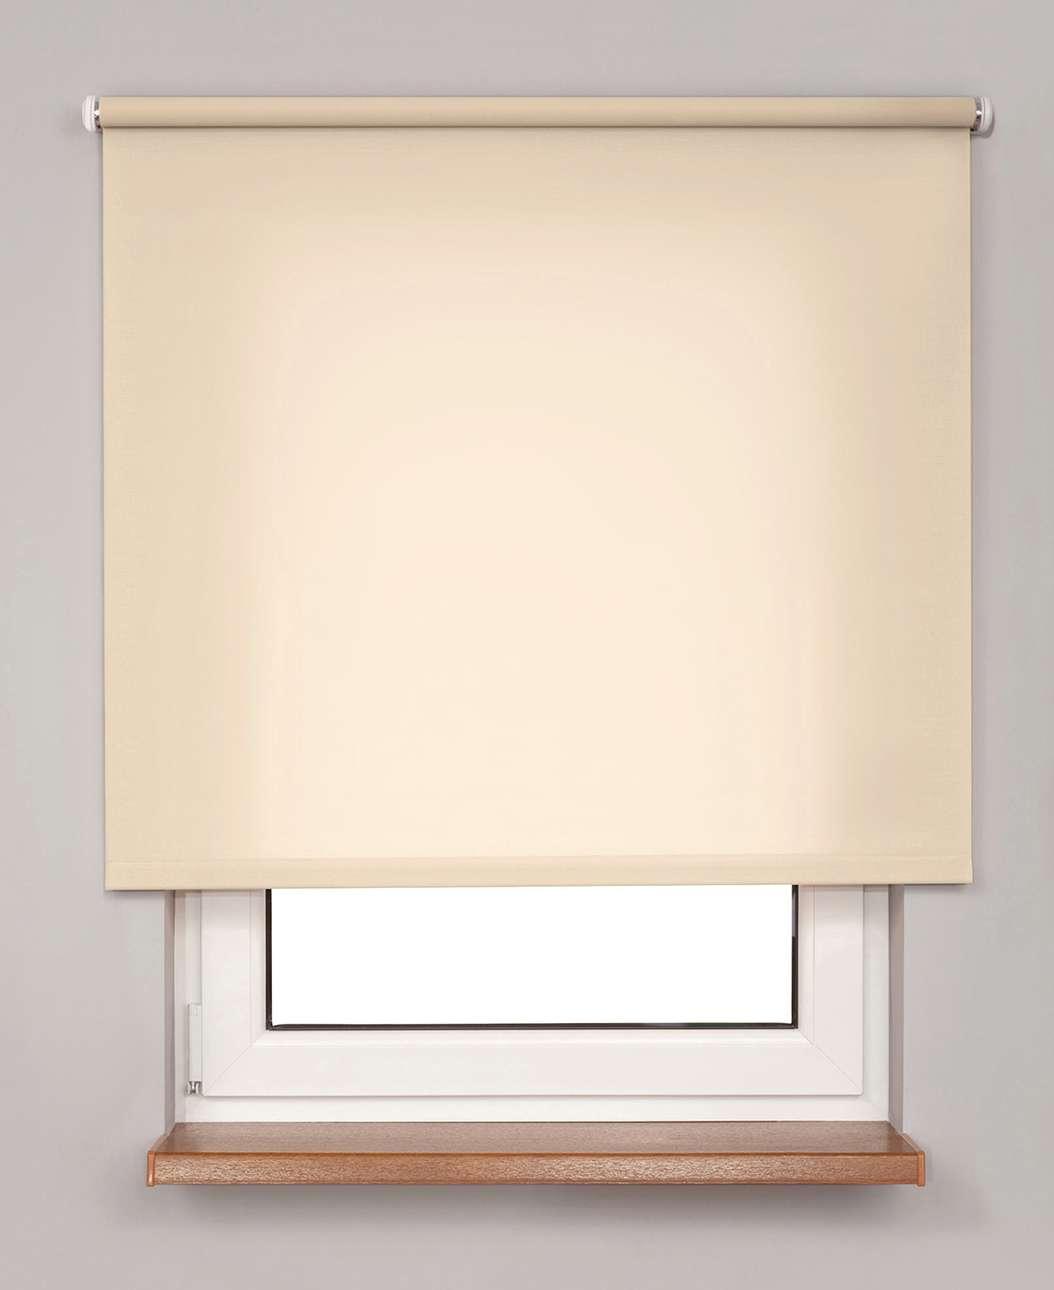 Blickdichtes Rollo mit Smartroll-System™ von der Kollektion Rollos- blickdicht, Stoff: 4996